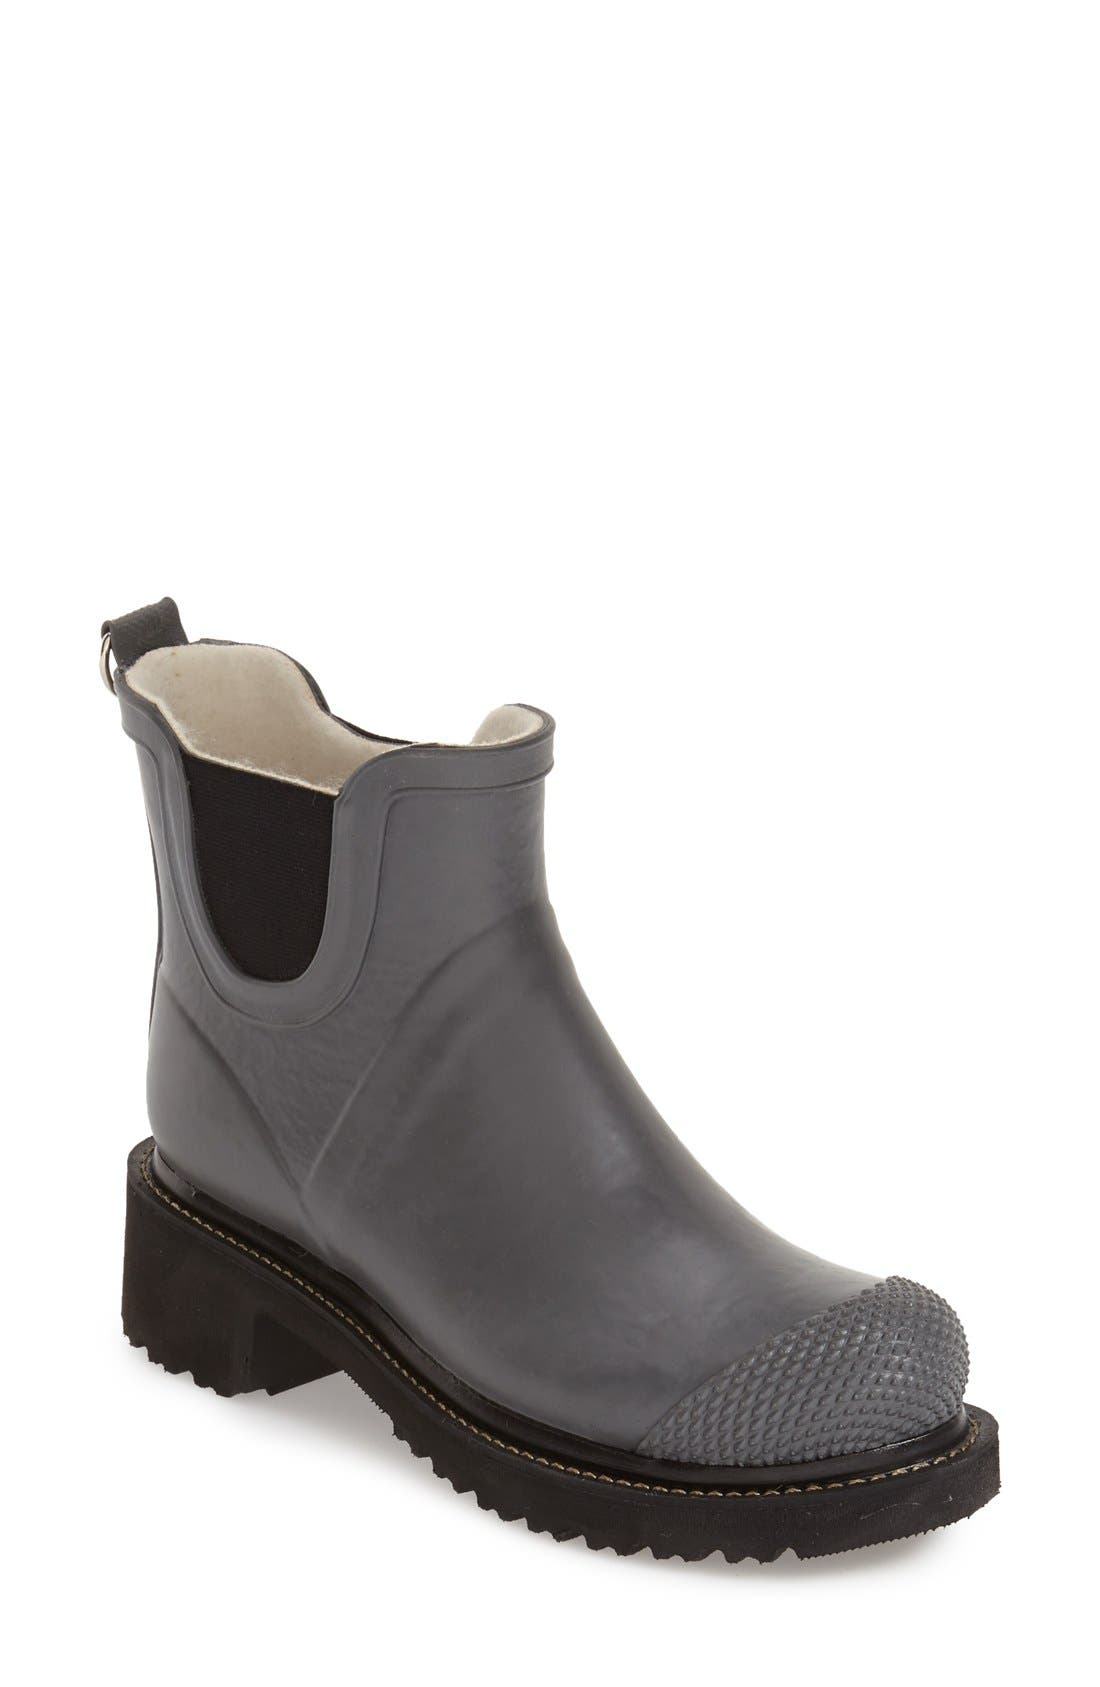 'RUB 47' Short Waterproof Rain Boot,                         Main,                         color, GREY